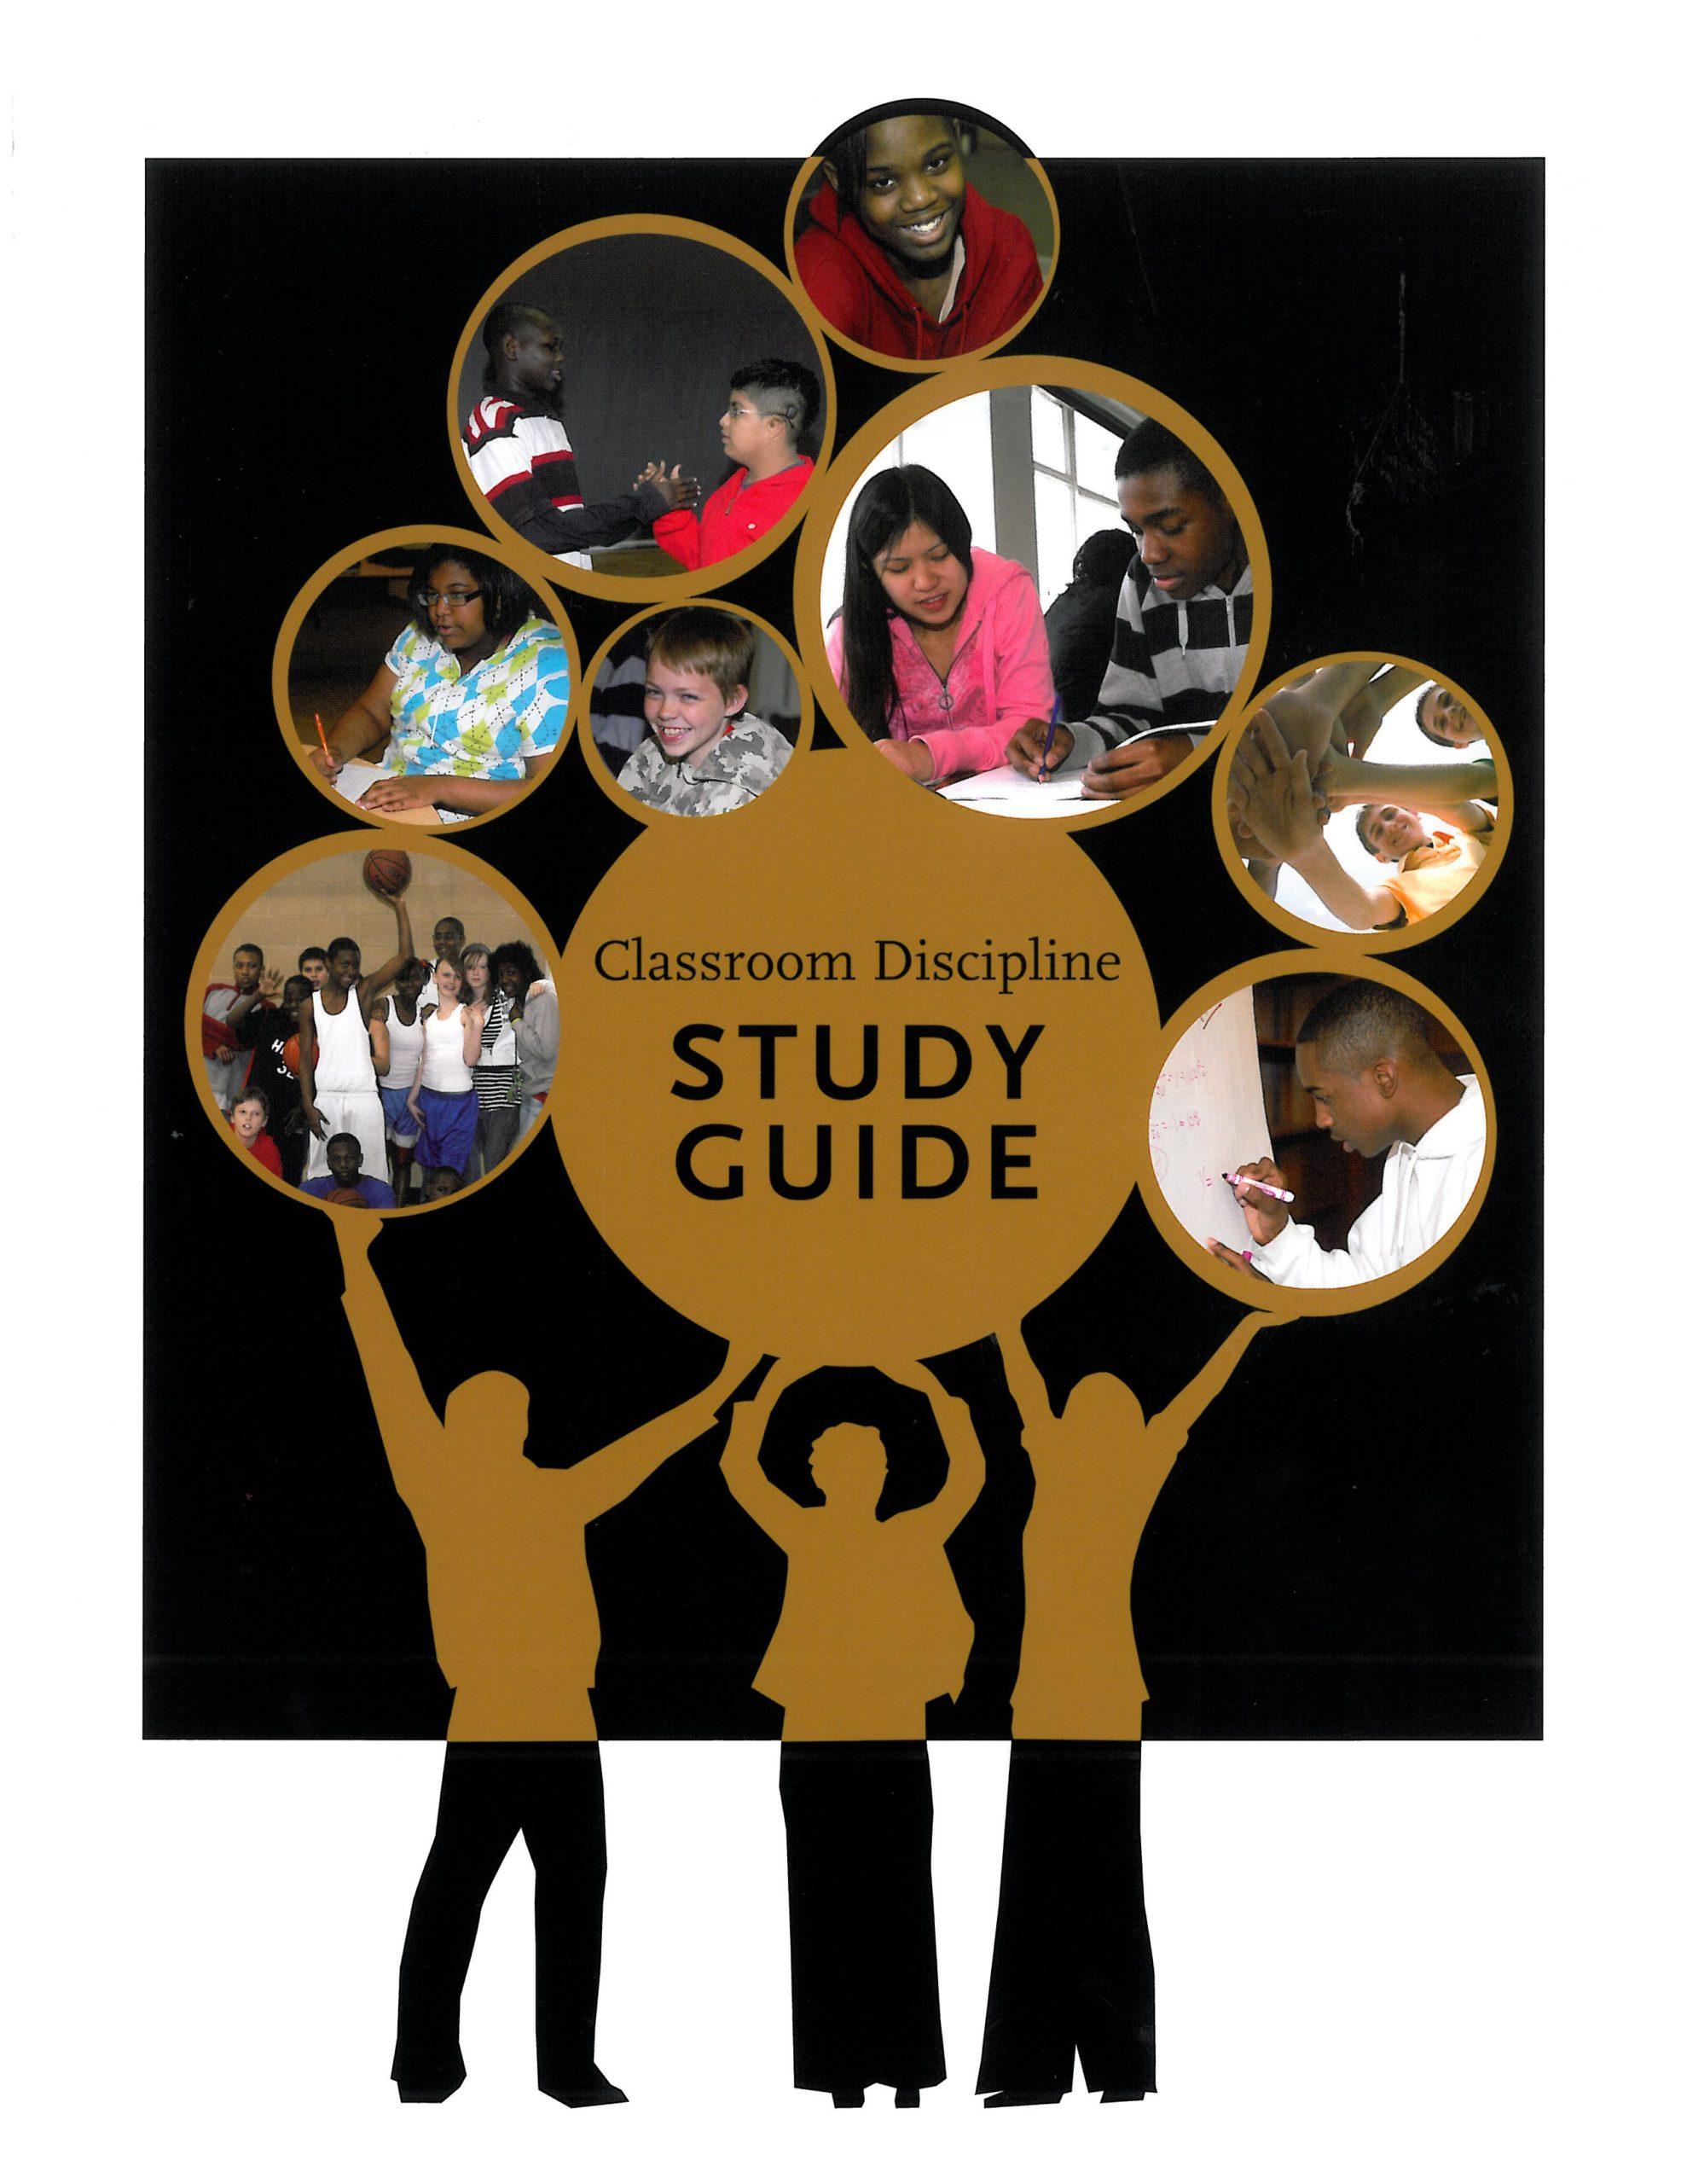 Classroom Discipline Study Guide